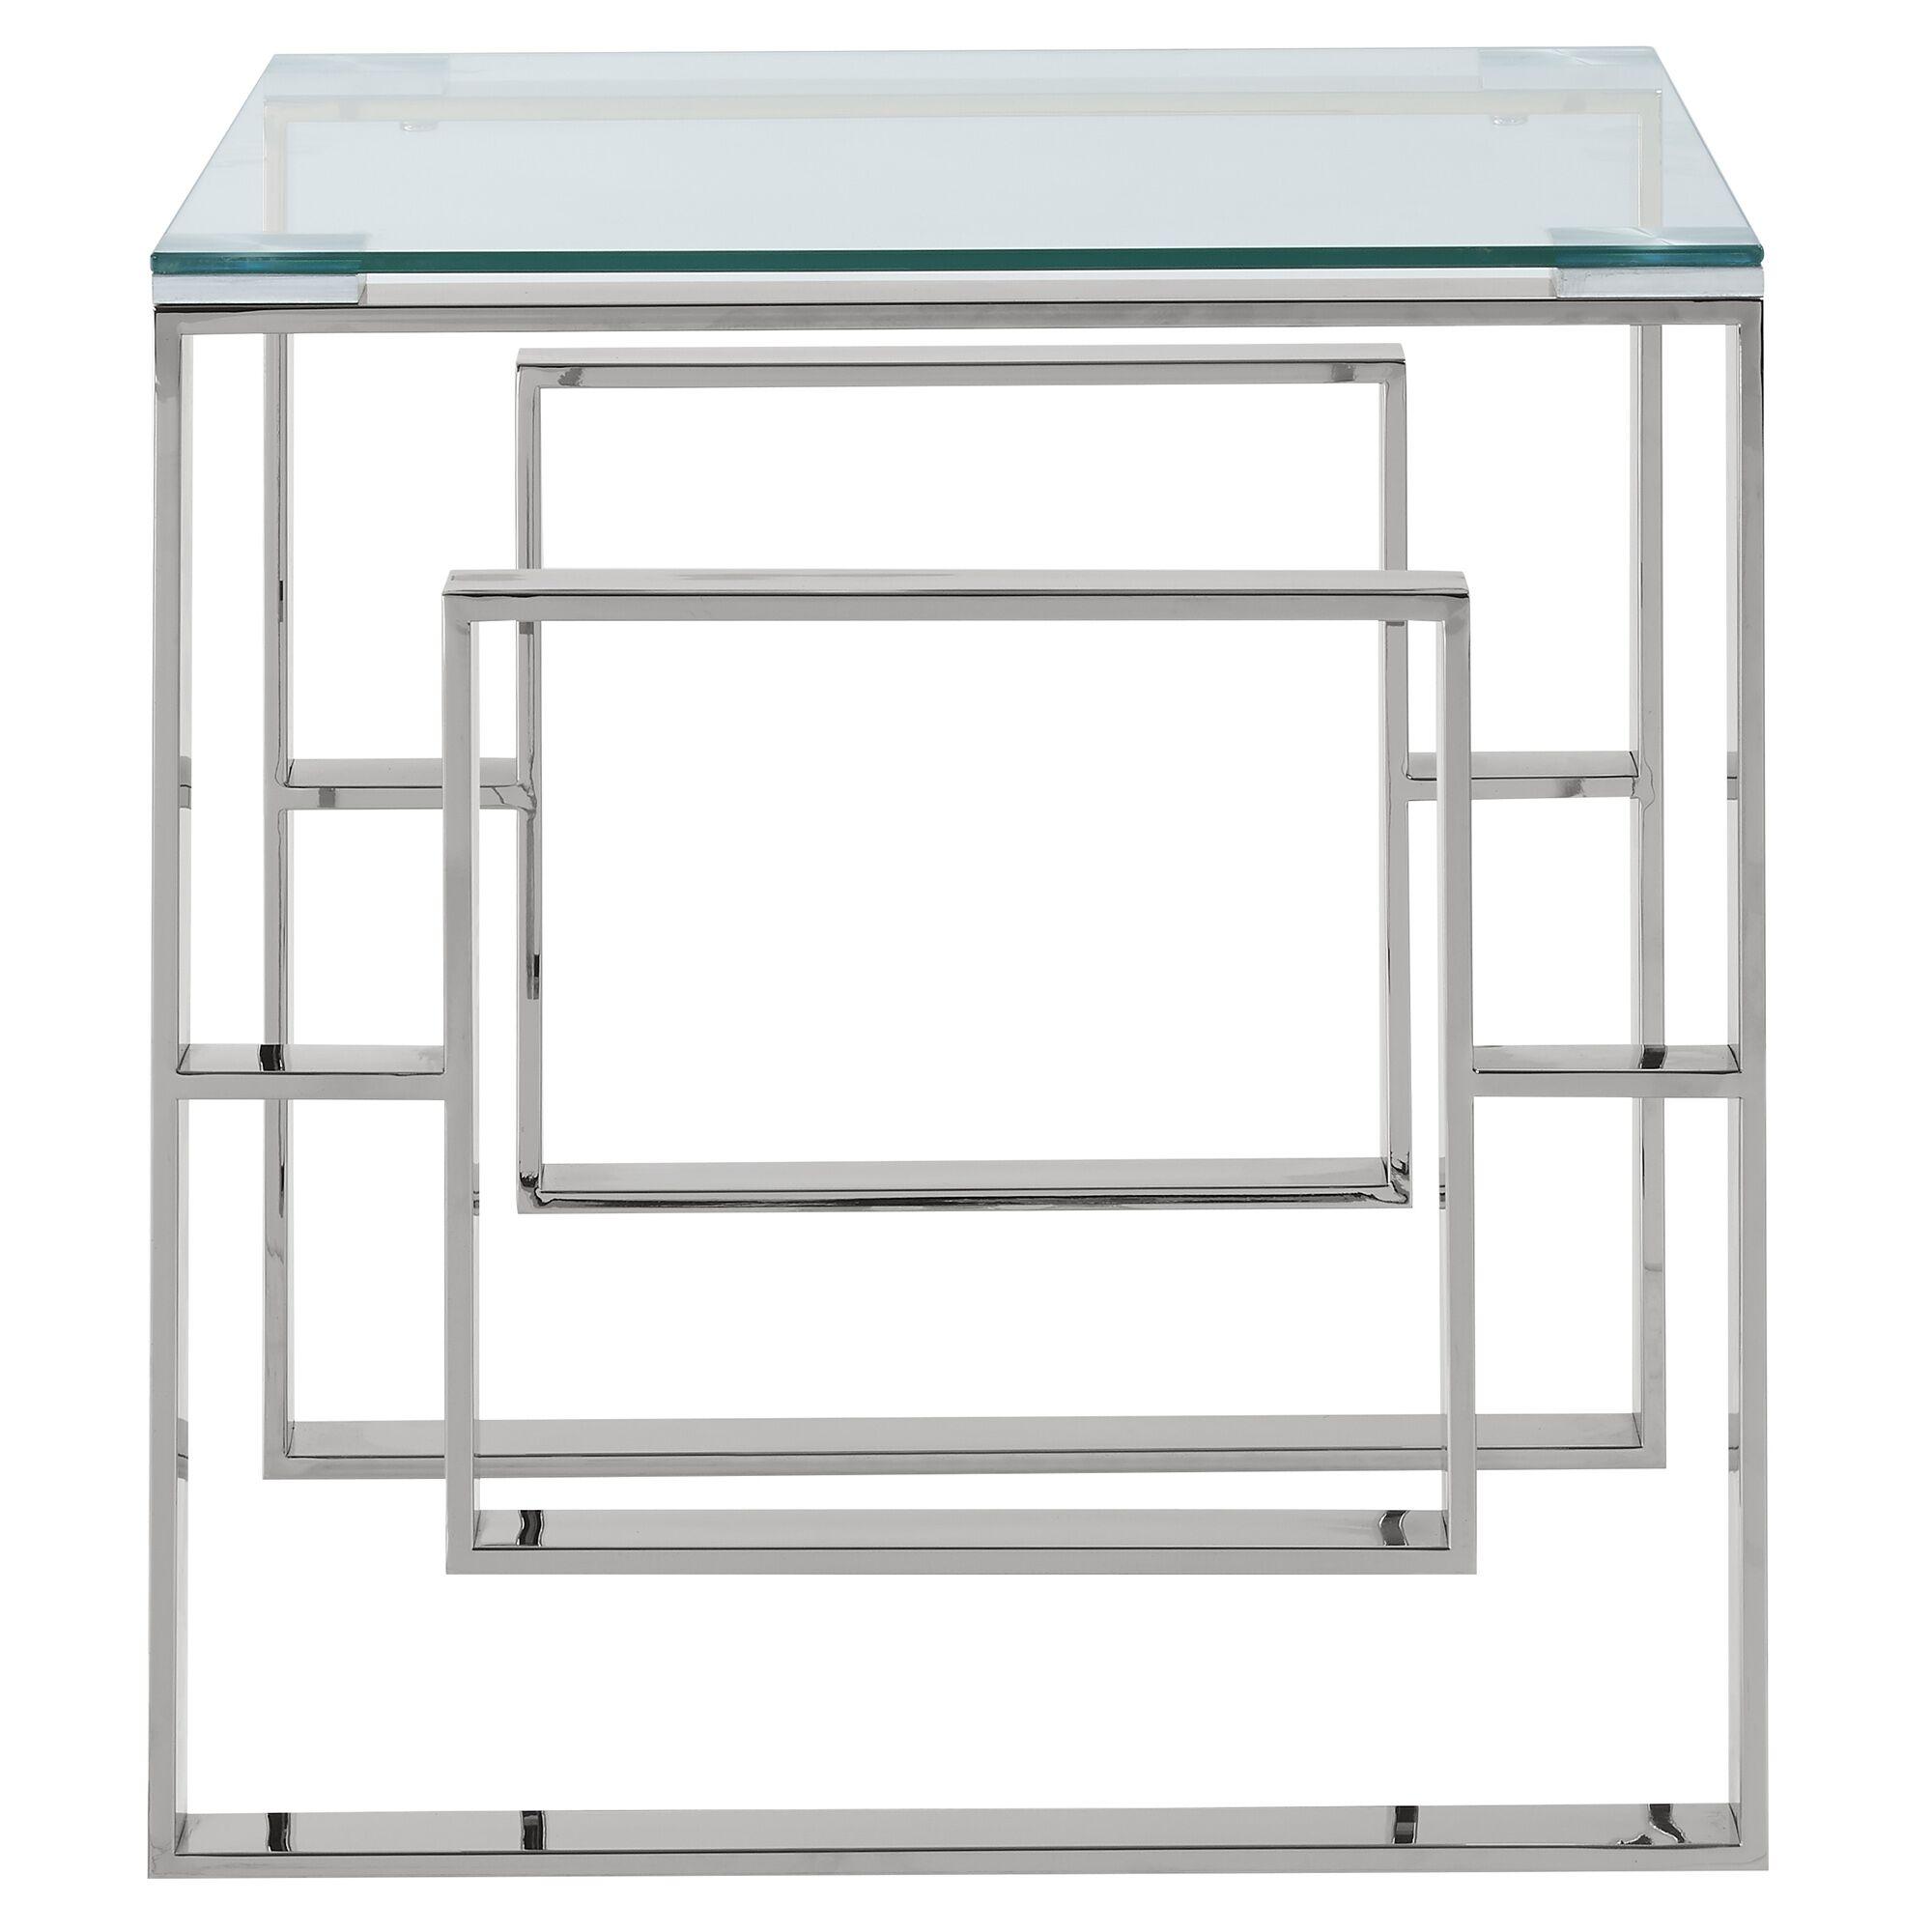 Melendez Stainless Steel End Table Color: Chrome